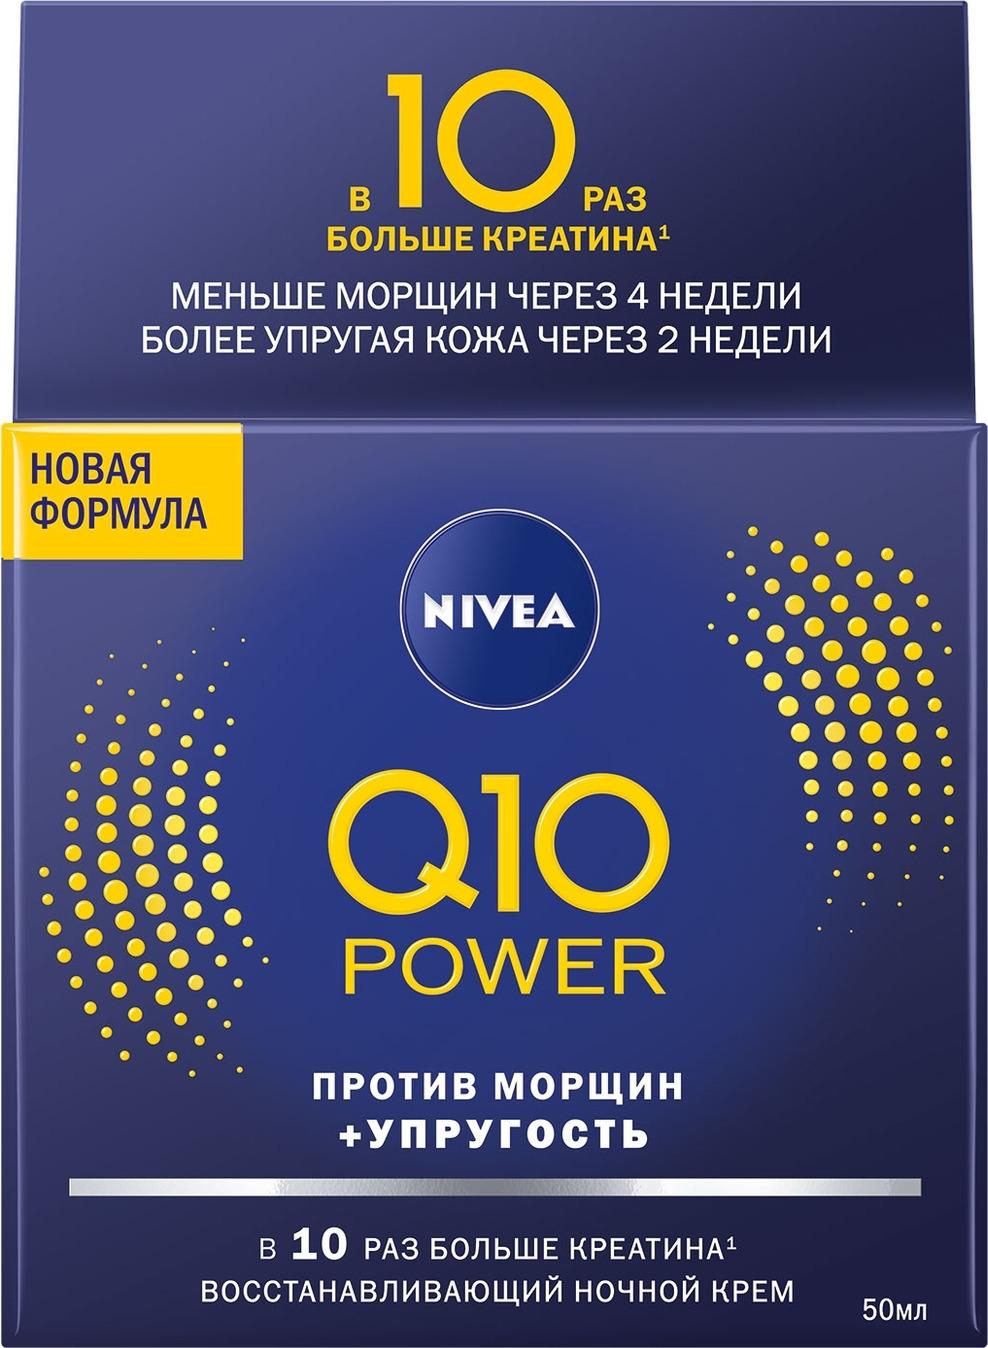 Увлажняющий ночной крем против морщин Nivea Q10 plus, 50 мл Nivea